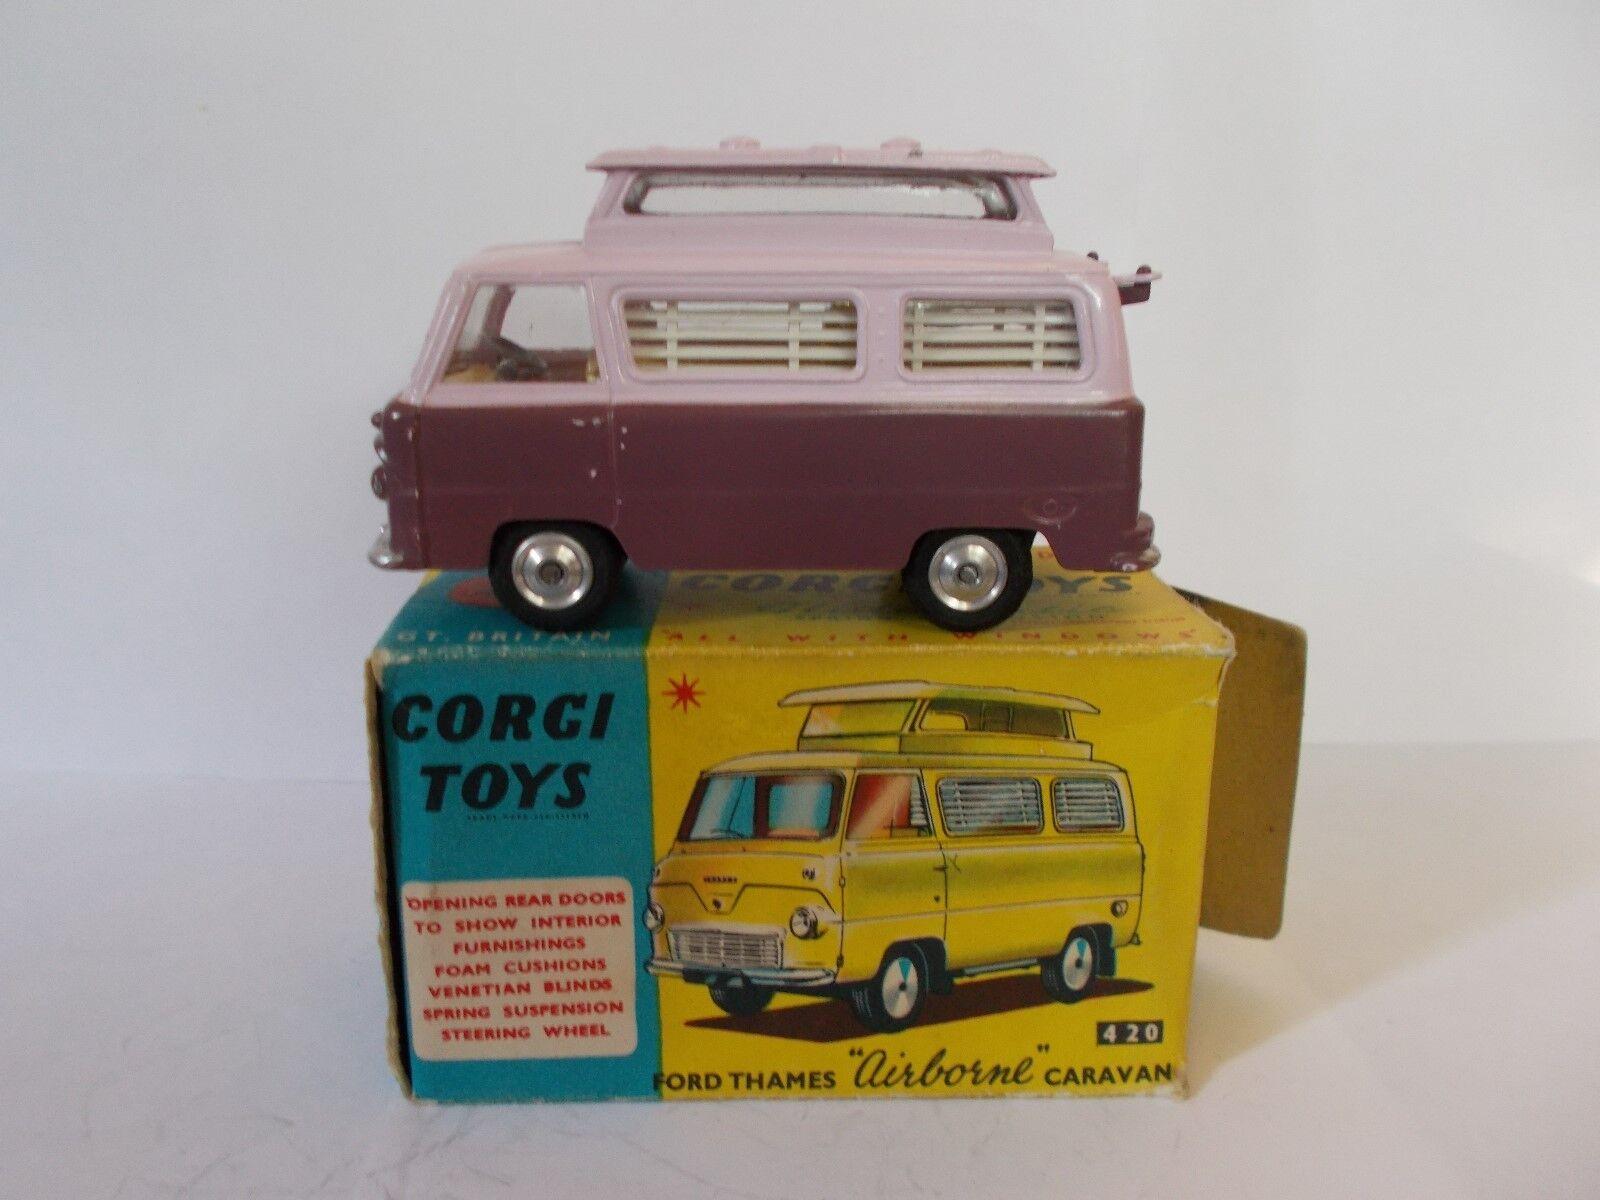 CORGI 420 Ford Thames Airbourne Caravan Vintage Coffret 1962